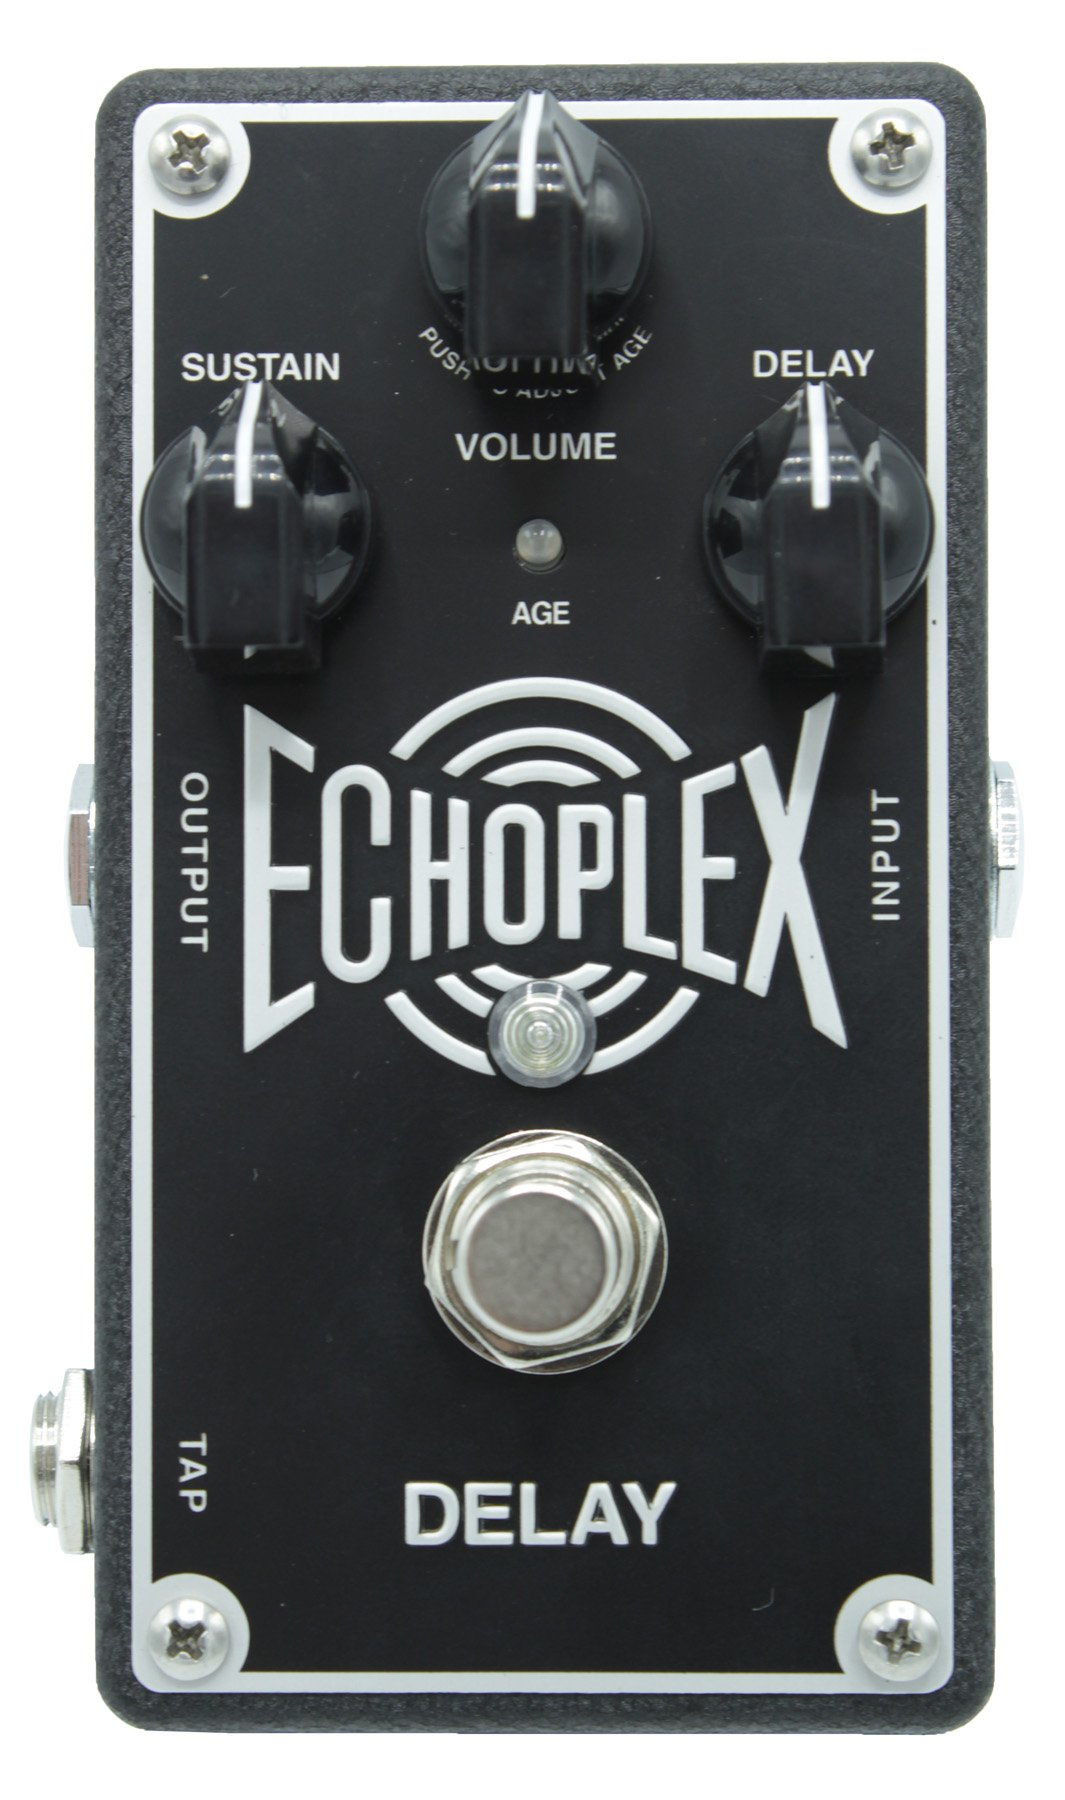 Dunlop Echoplex Delay Guitar Effects Pedal